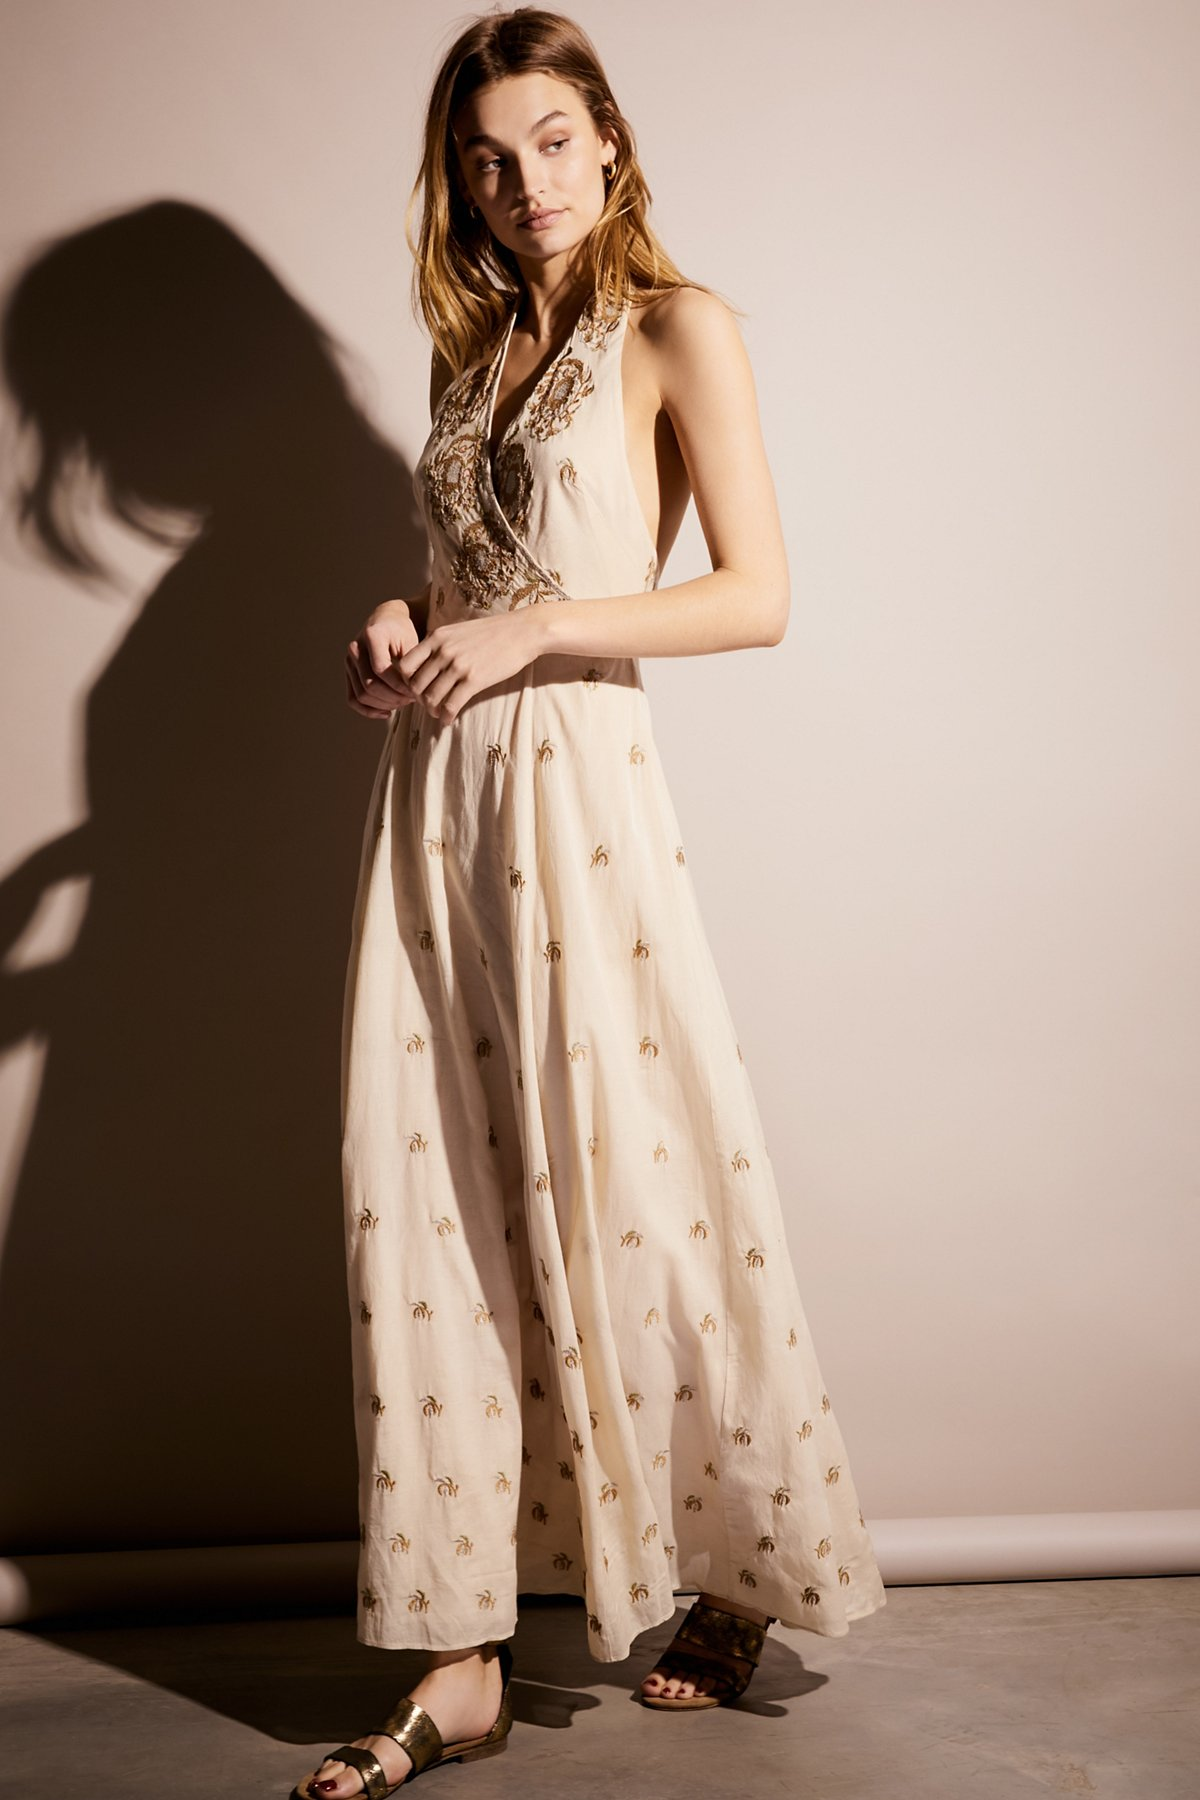 Kristin's限量版白色连衣裙